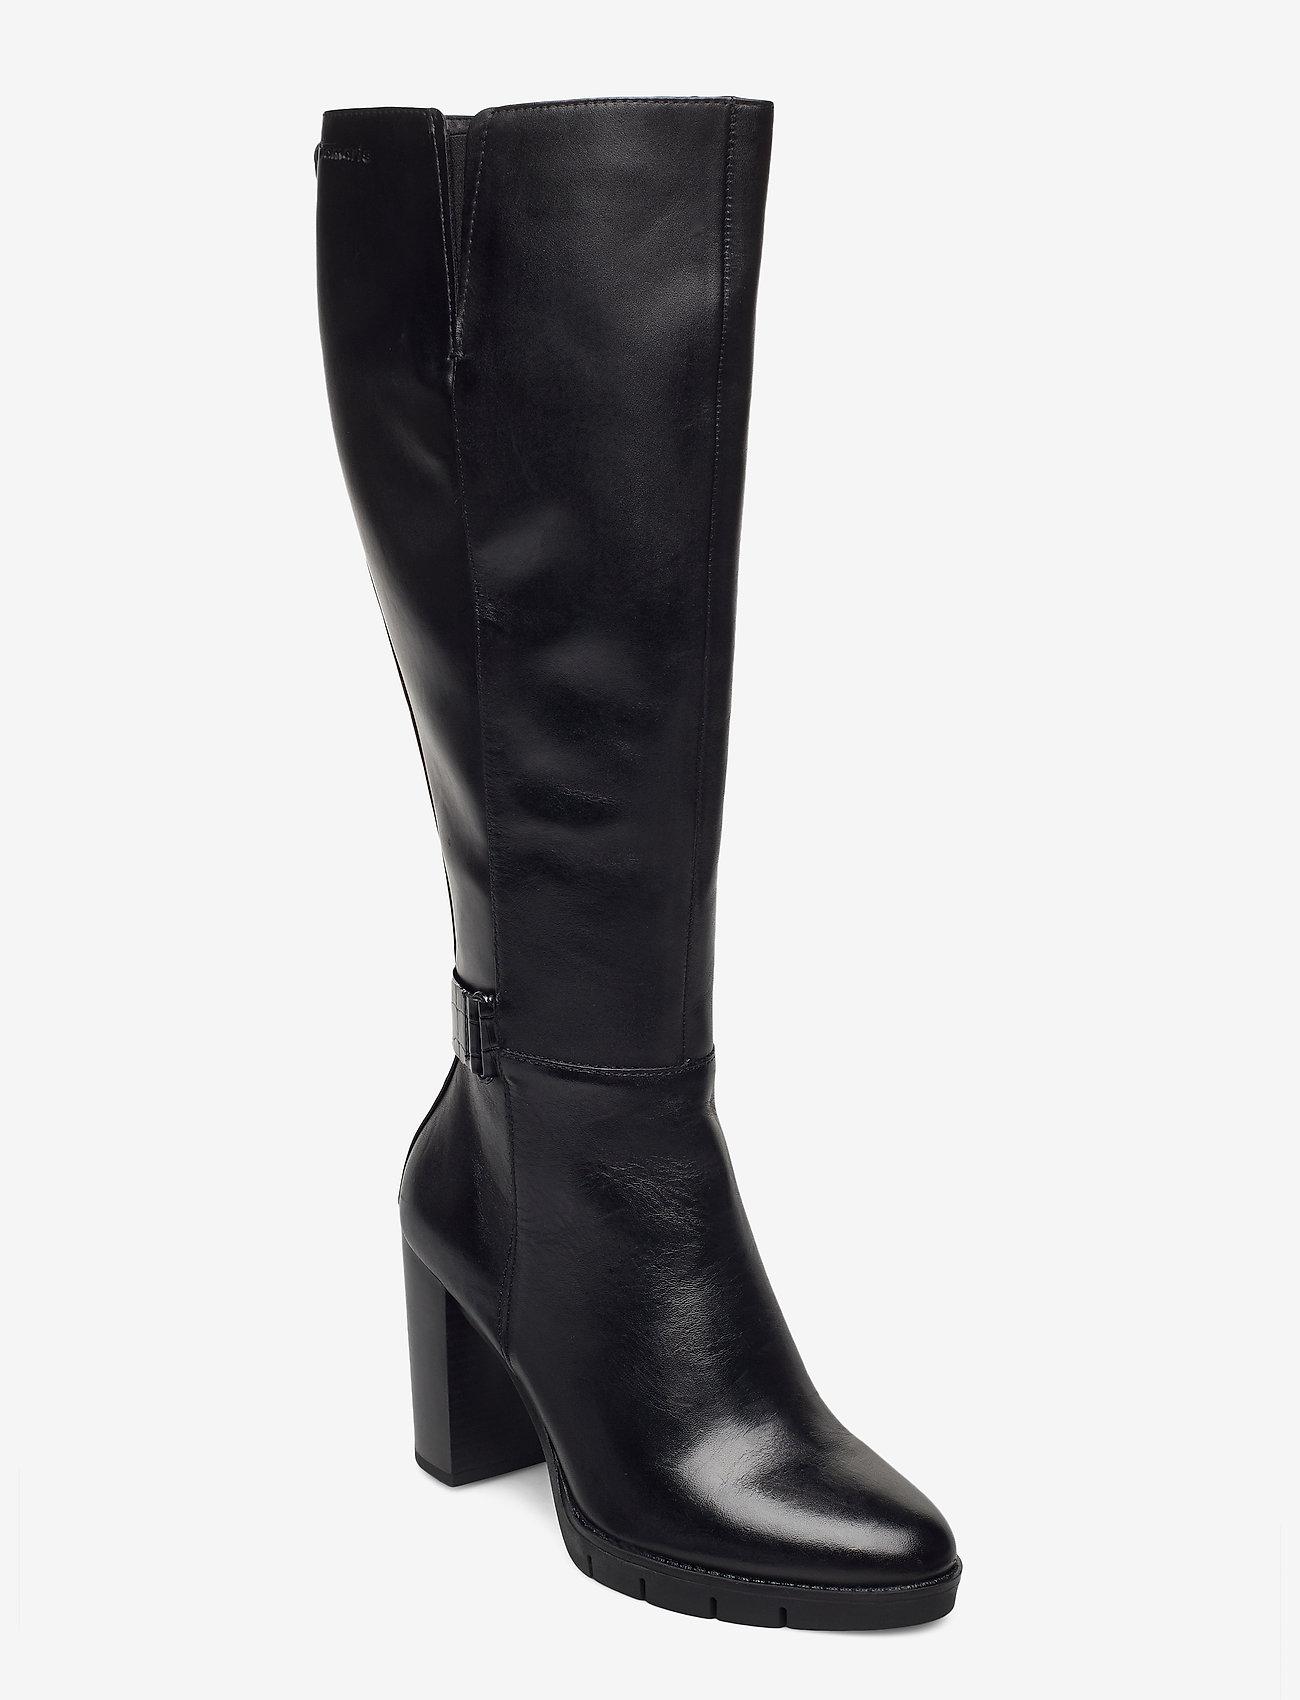 Tamaris - Woms Boots - höga stövlar - black/croco - 0